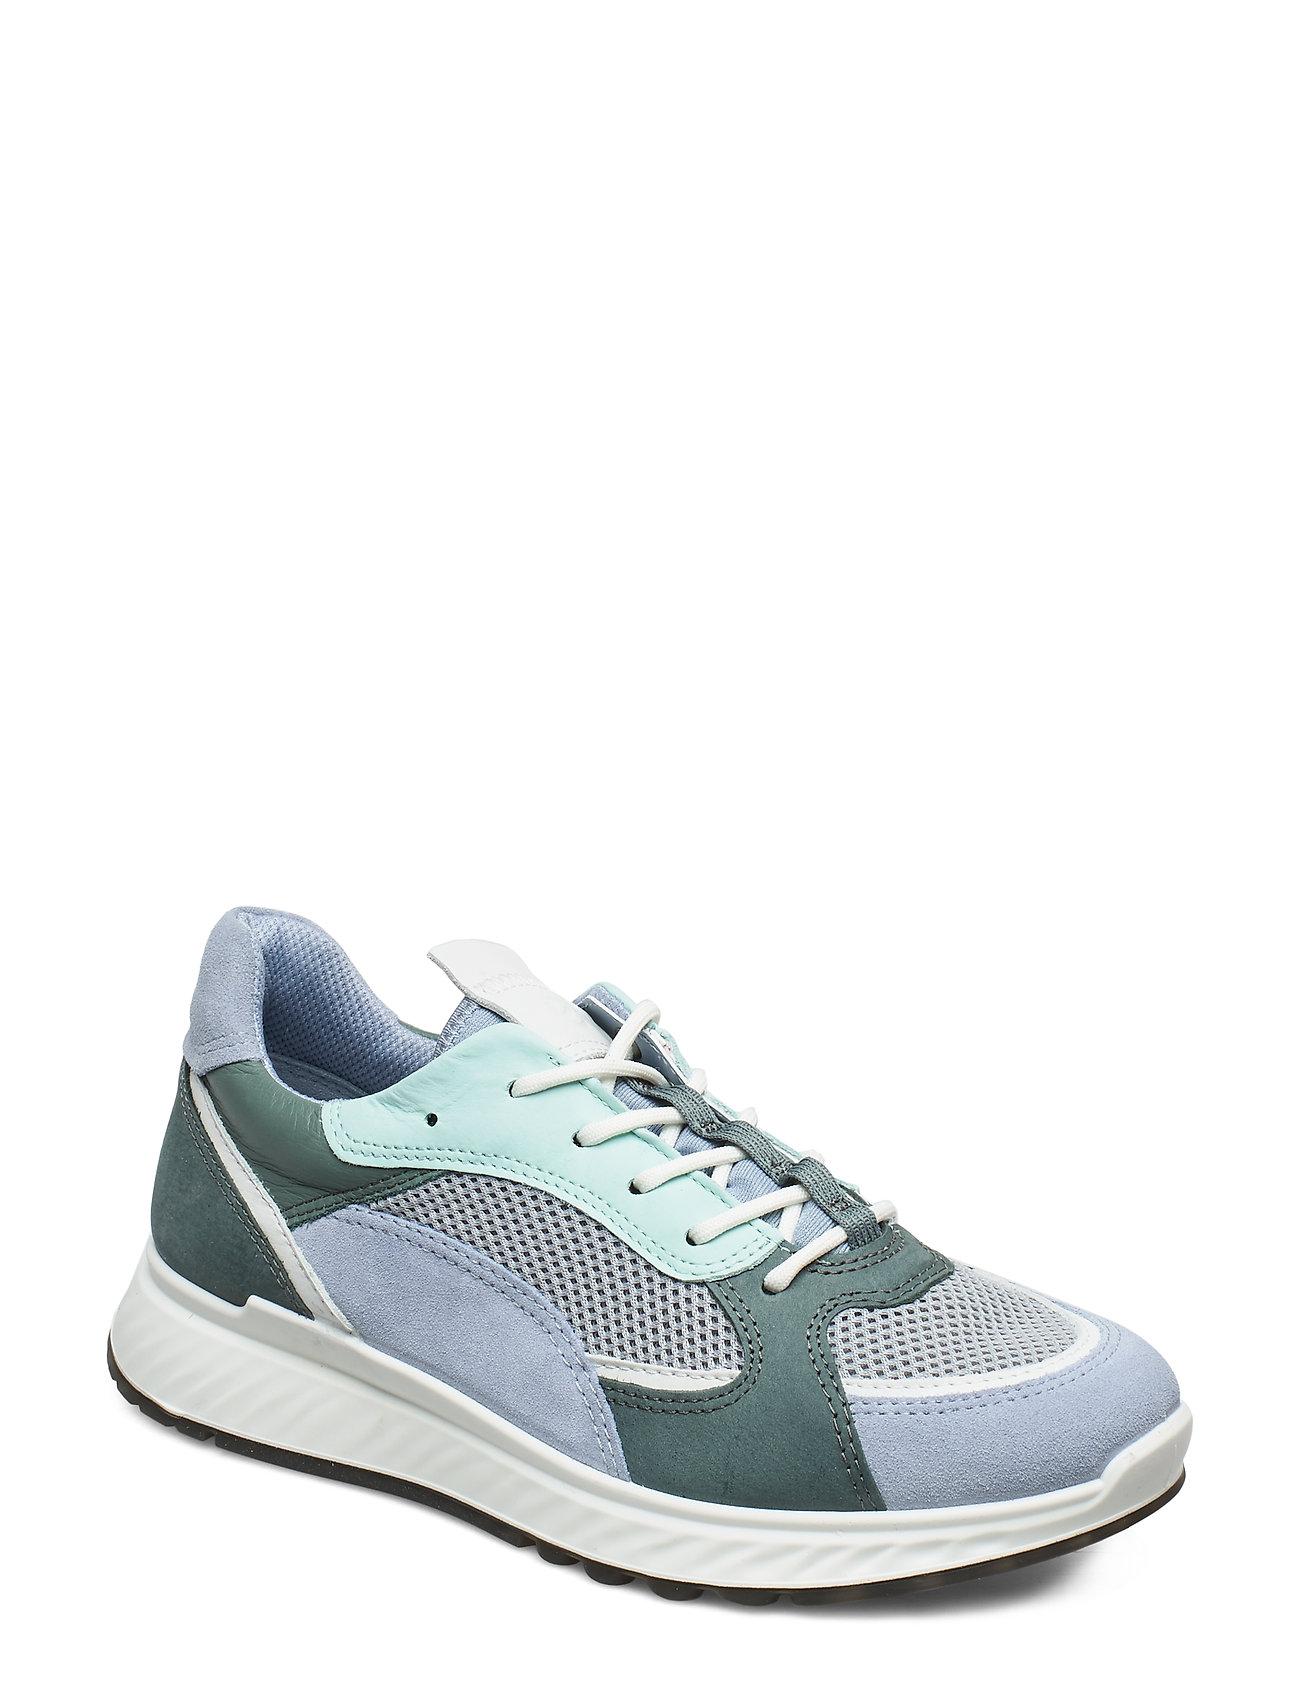 Image of St.1 W Low-top Sneakers Blå ECCO (3307689893)